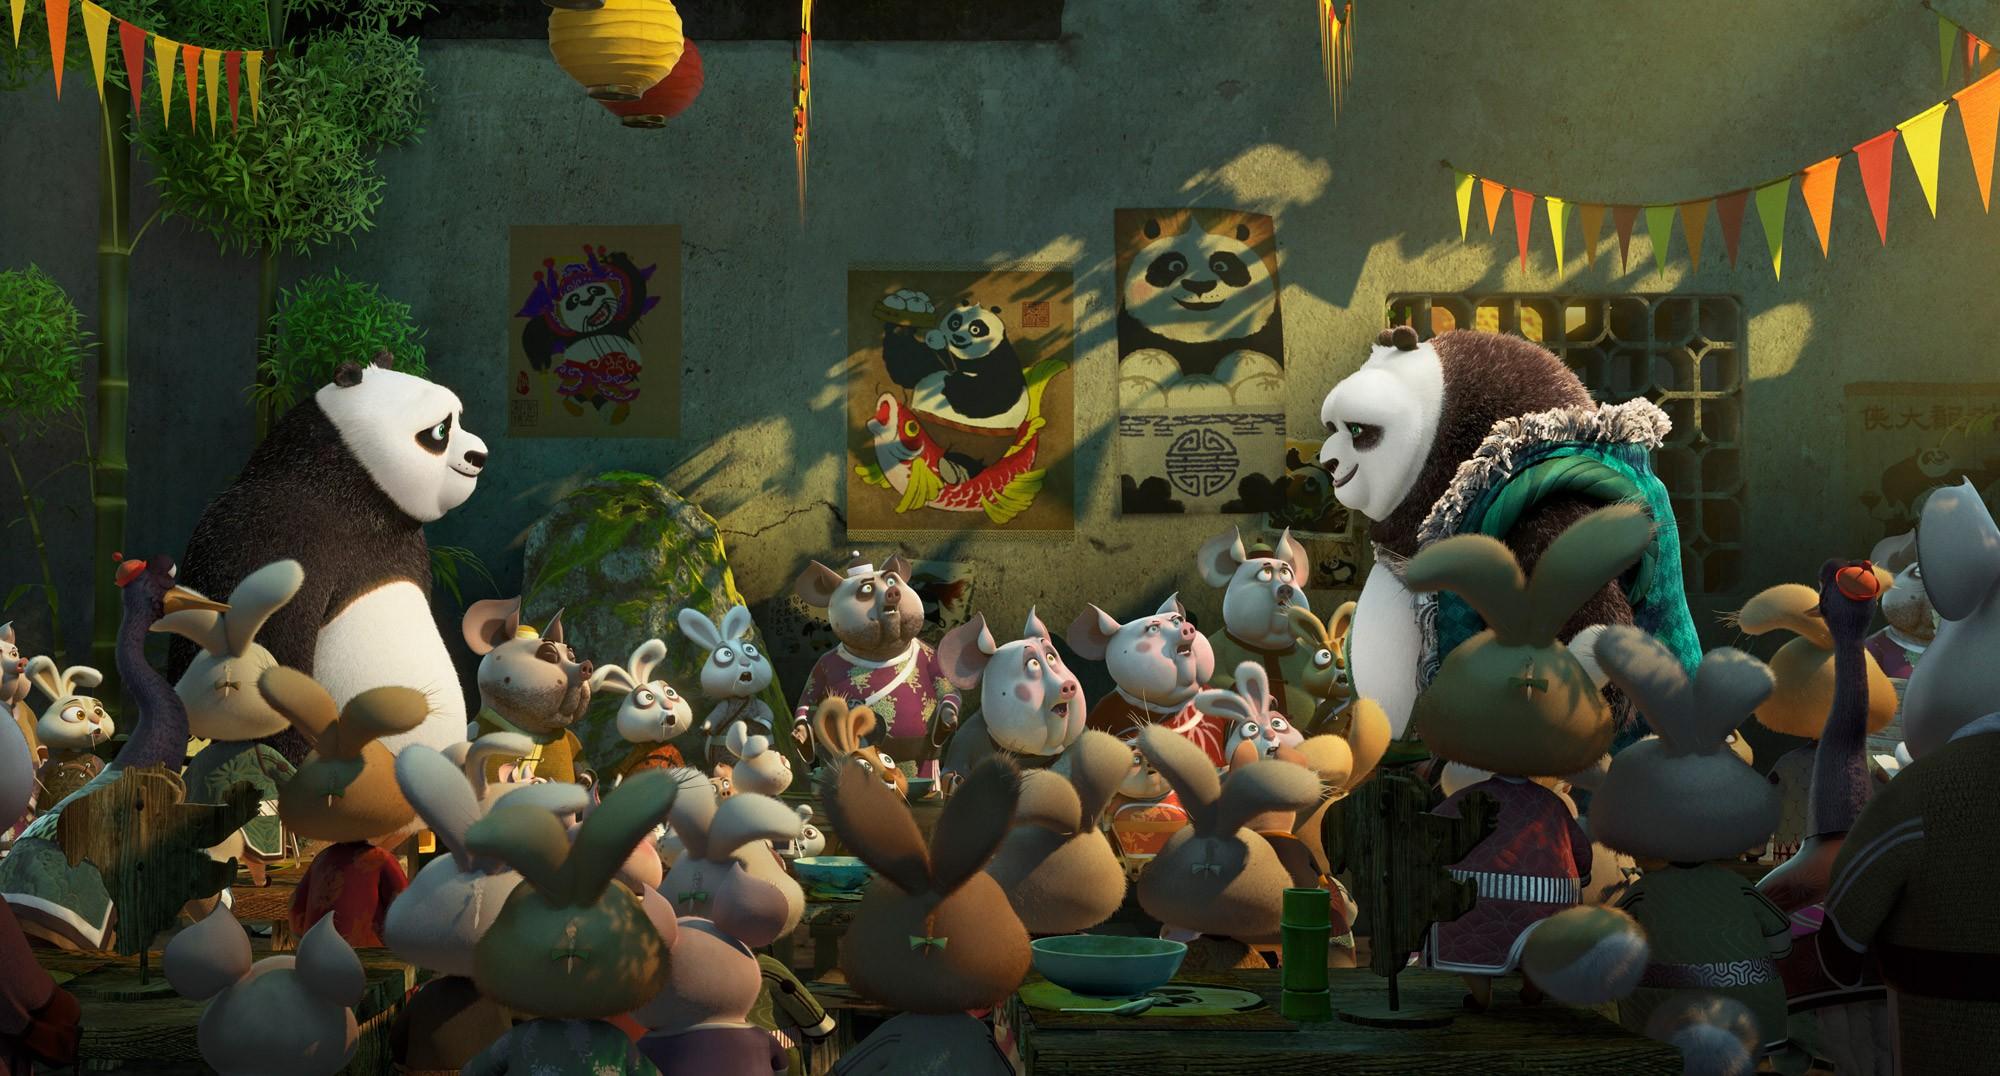 kung-fu-panda-3-03.jpg